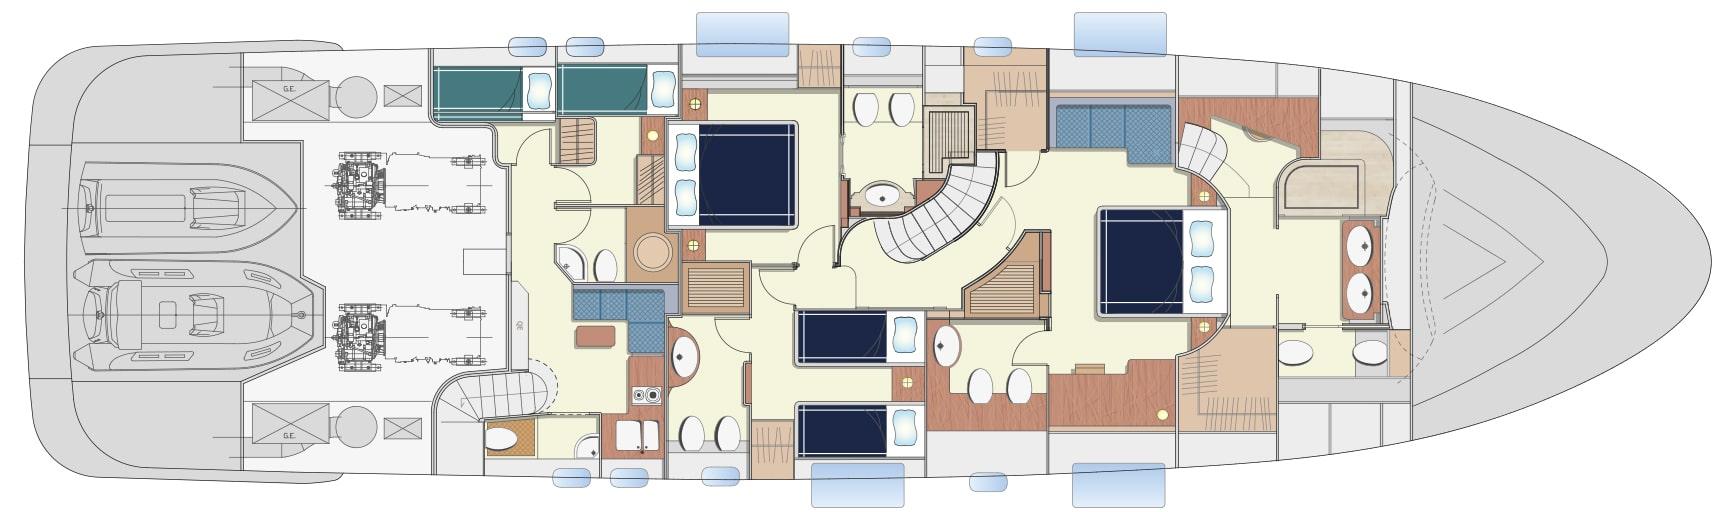 Lower Deck Version A 3 cabins